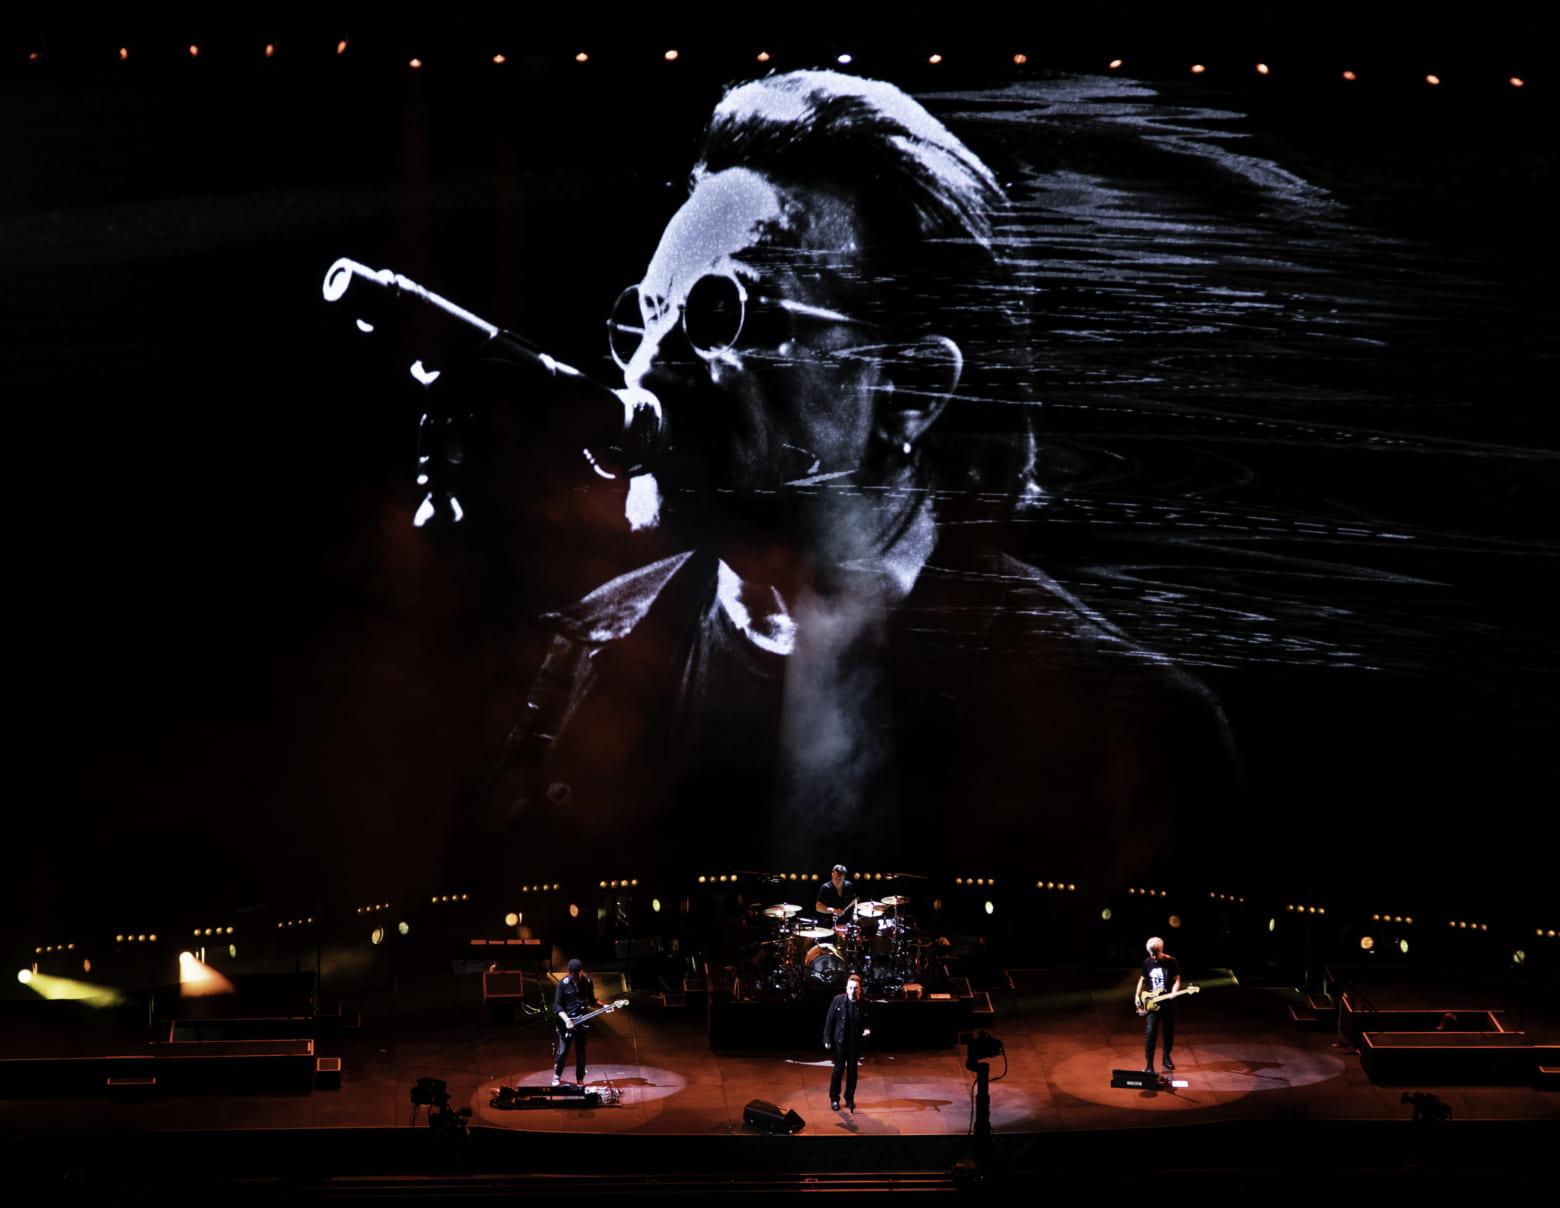 U2 12月4日 さいたまスーパーアリーナ公演 Photo by ROSS STEWART